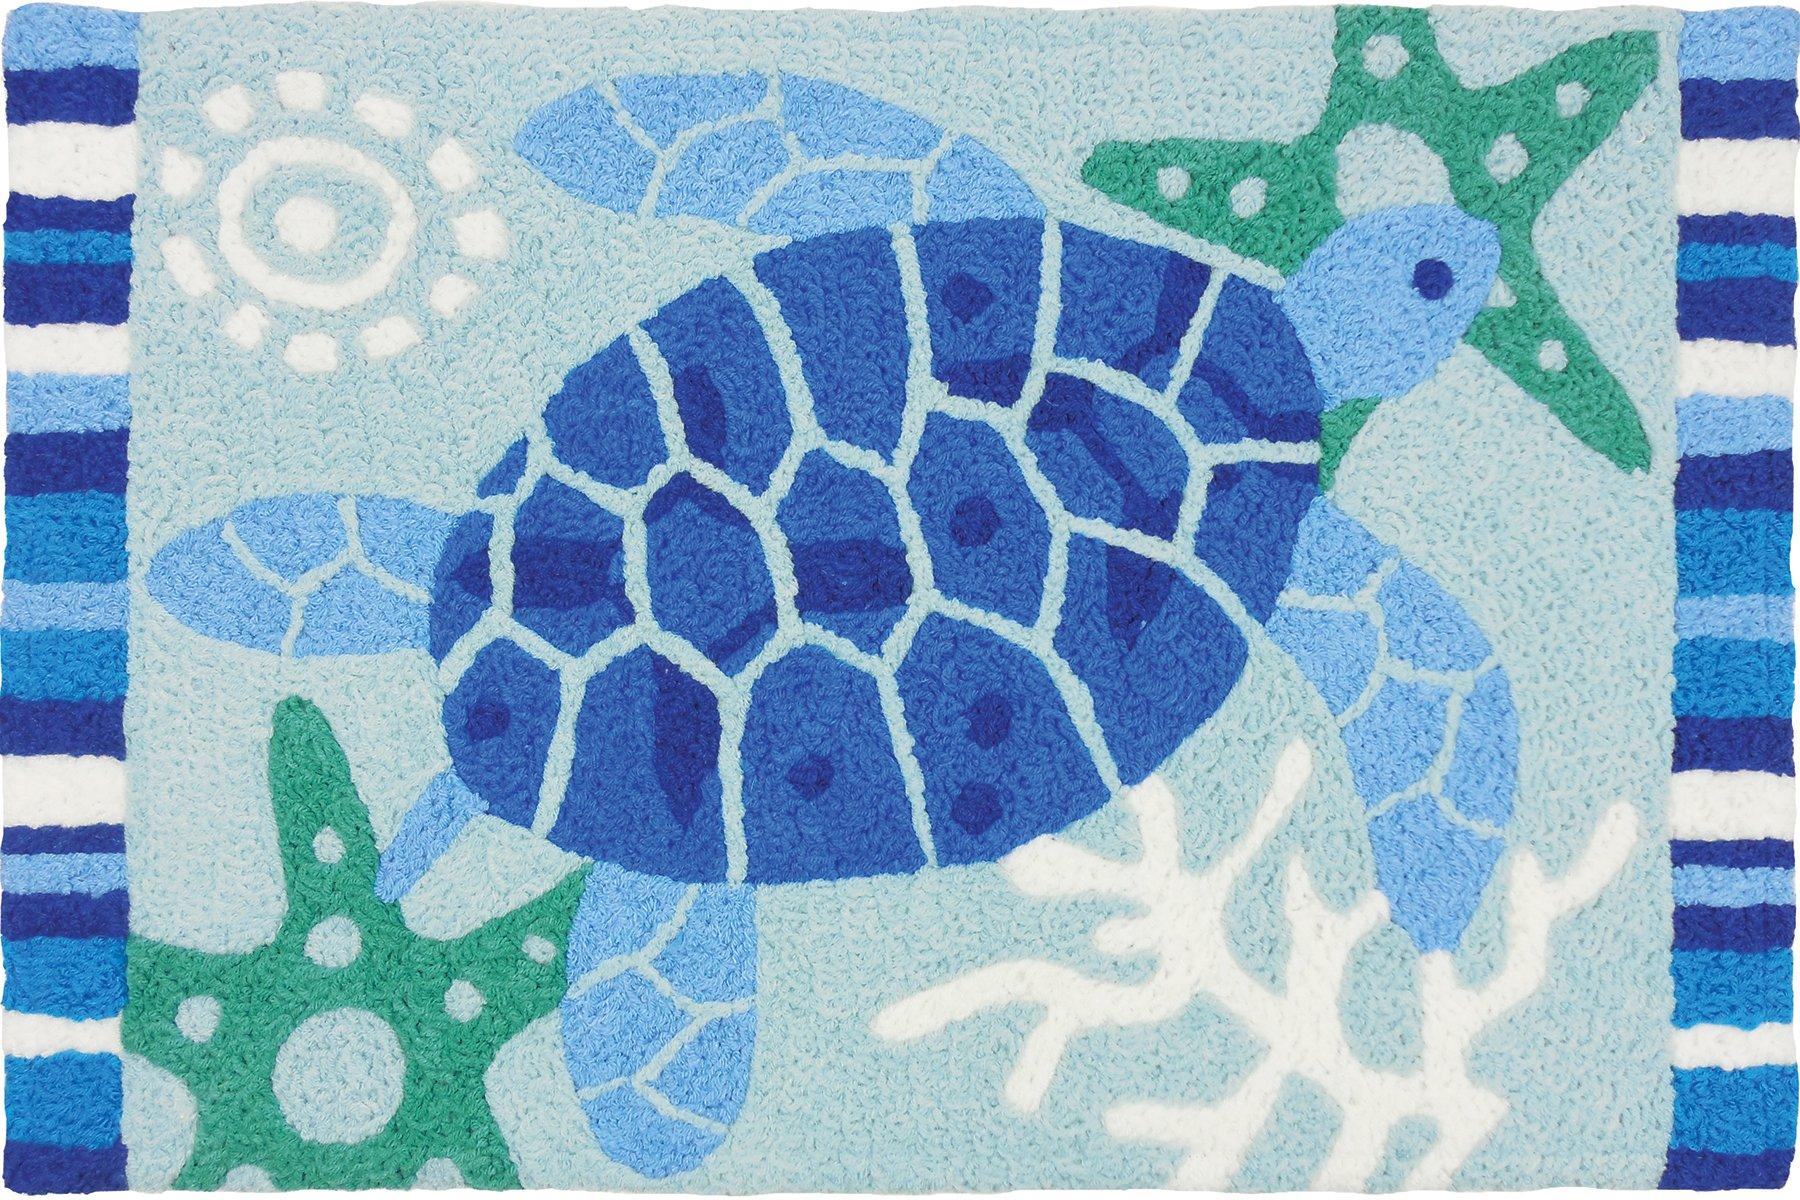 Jellybean Indoor Outdoor Machine Washable Rug, Blue Sea Turtle